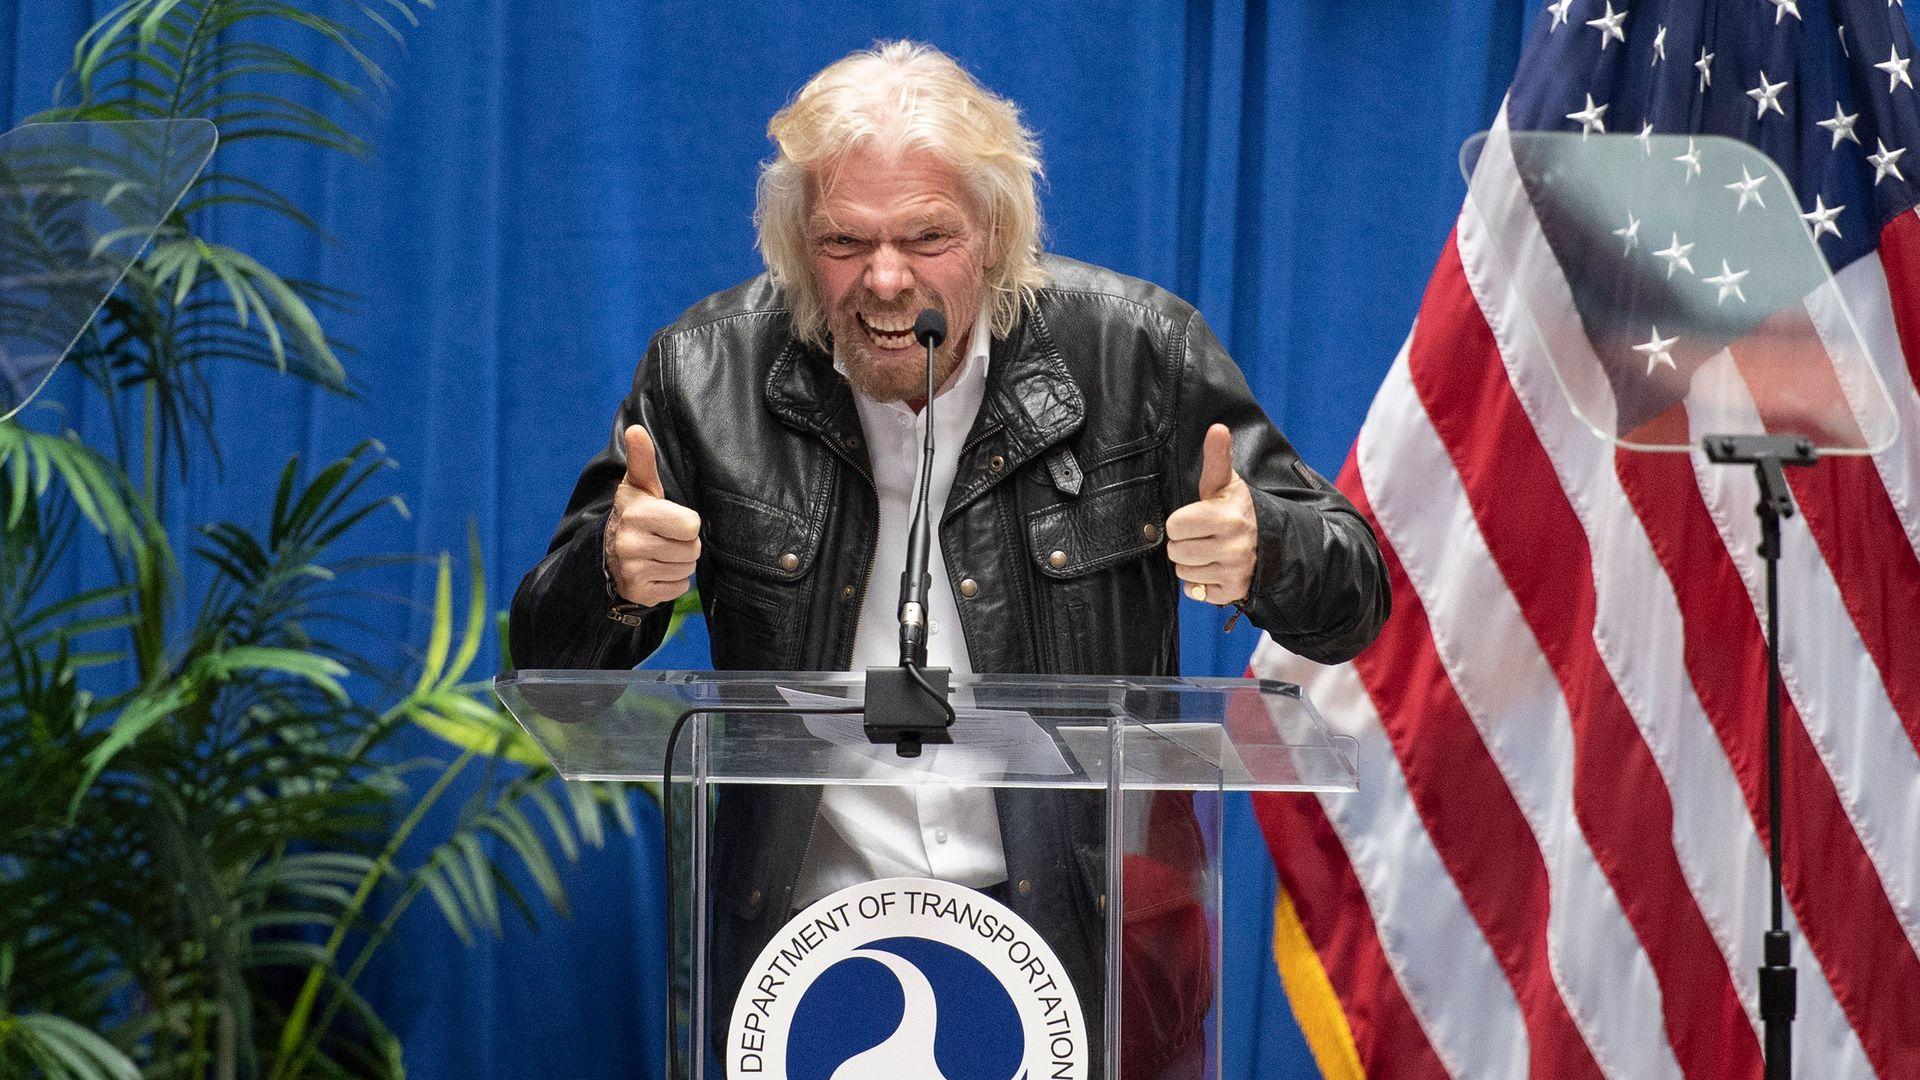 Virgin Galactic founder Sir Richard Branson